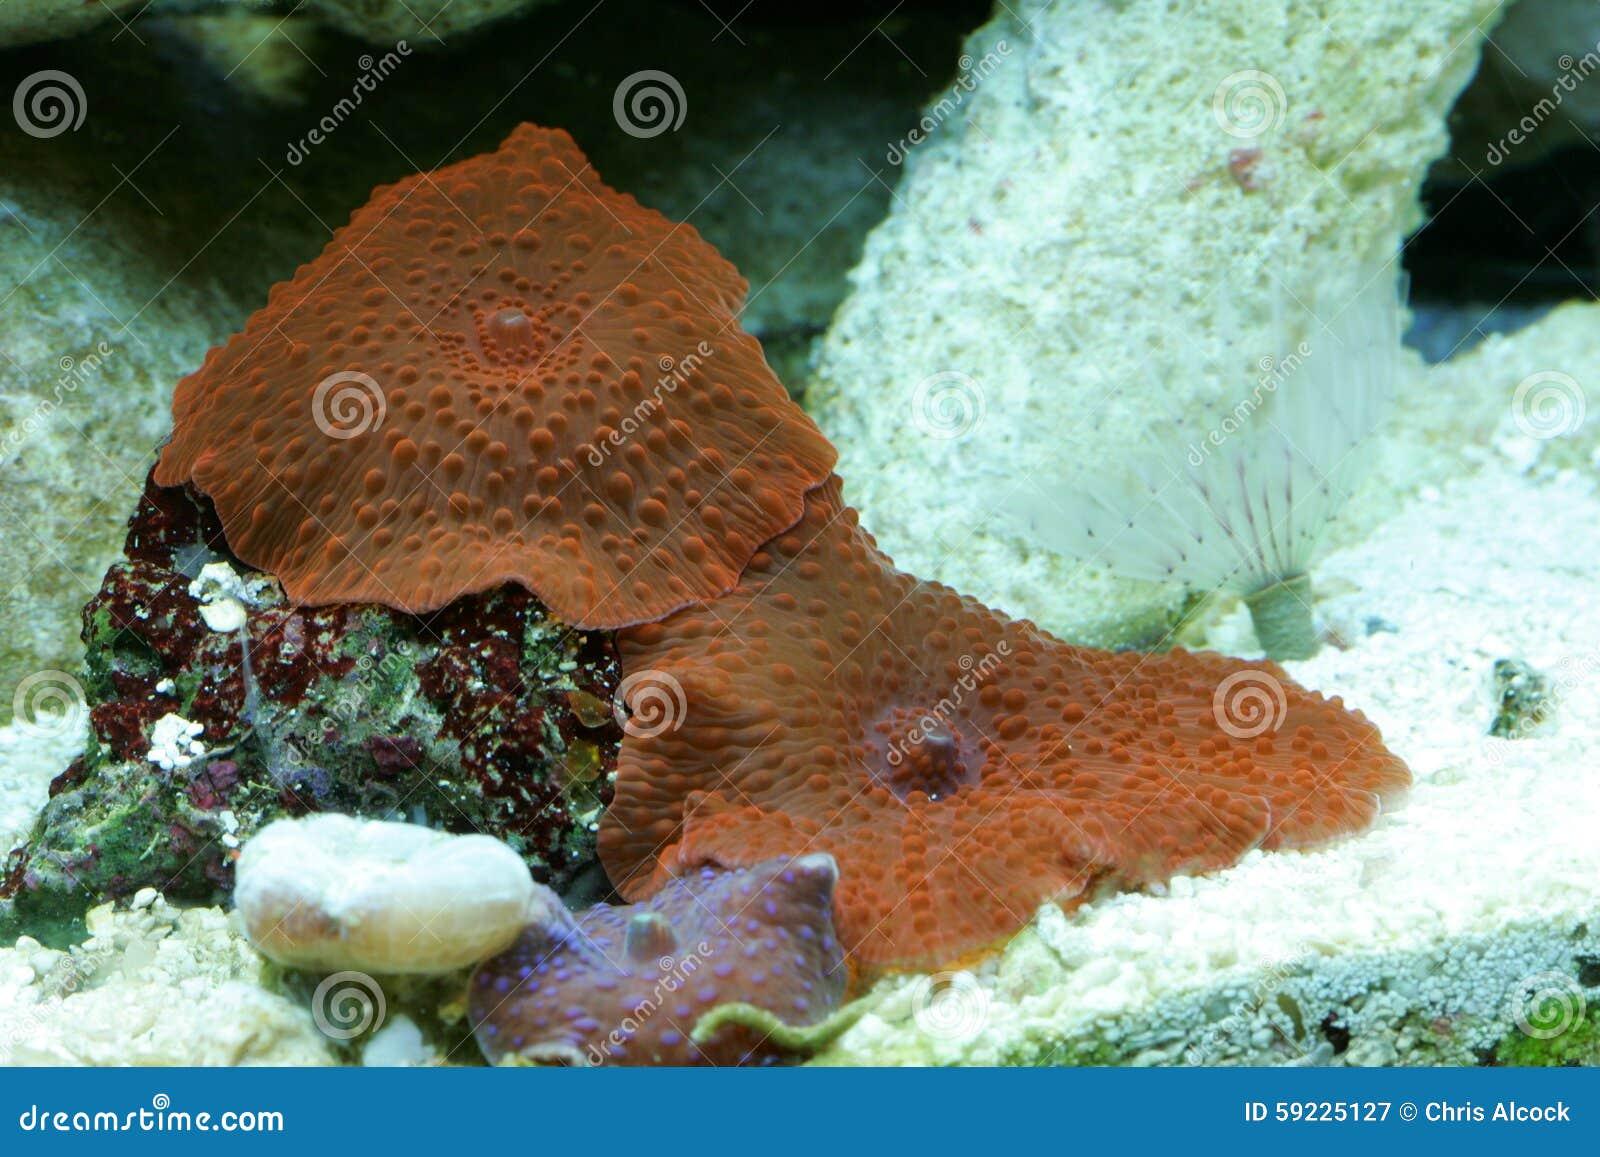 Salt water fish tank coral reef